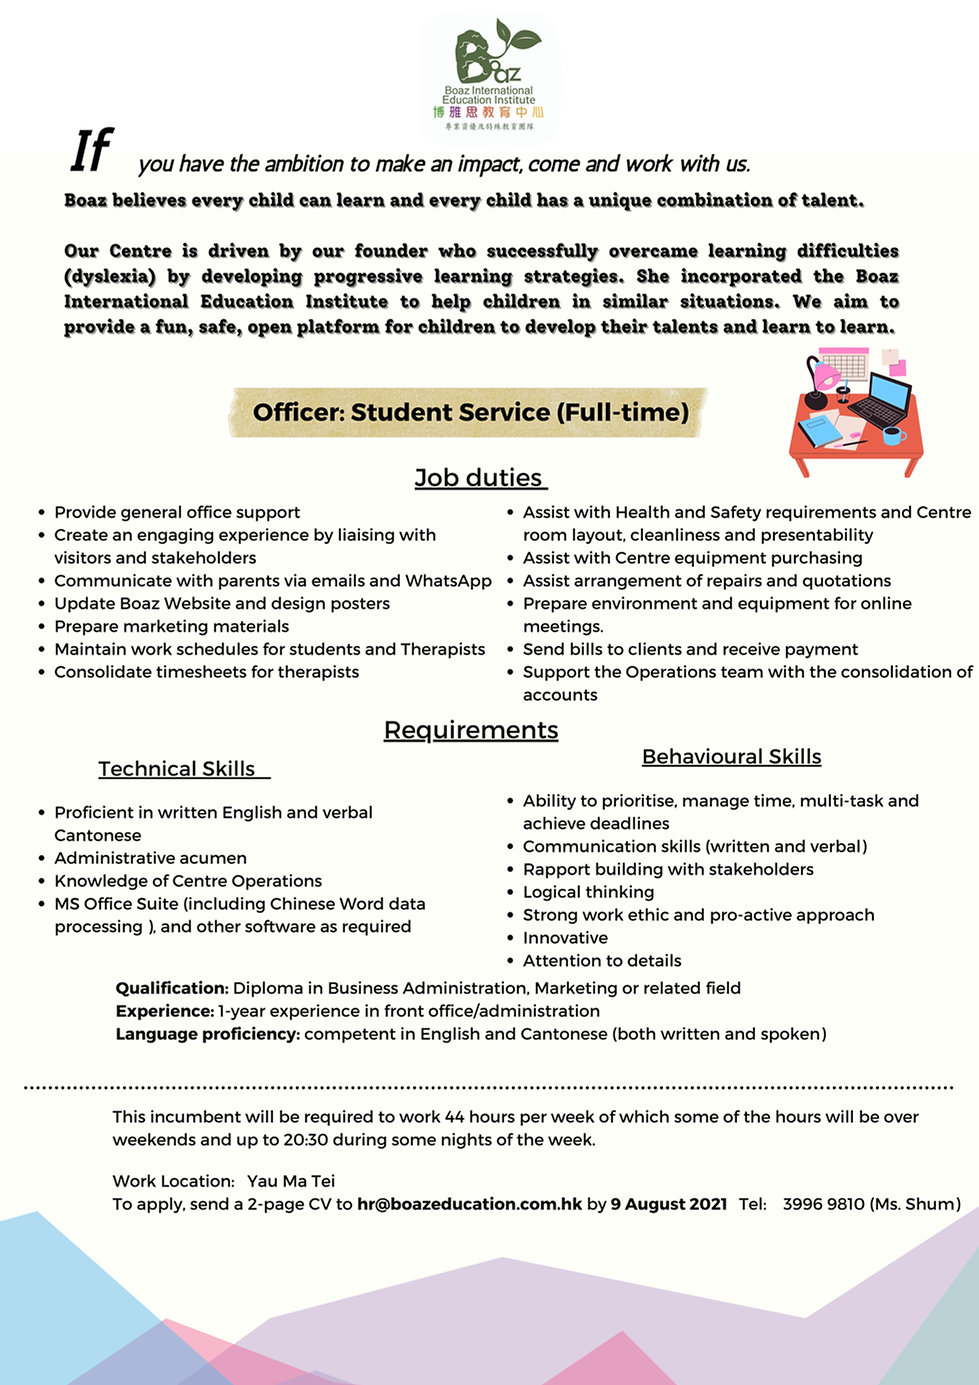 _officer Student Service  Final ver.jpg